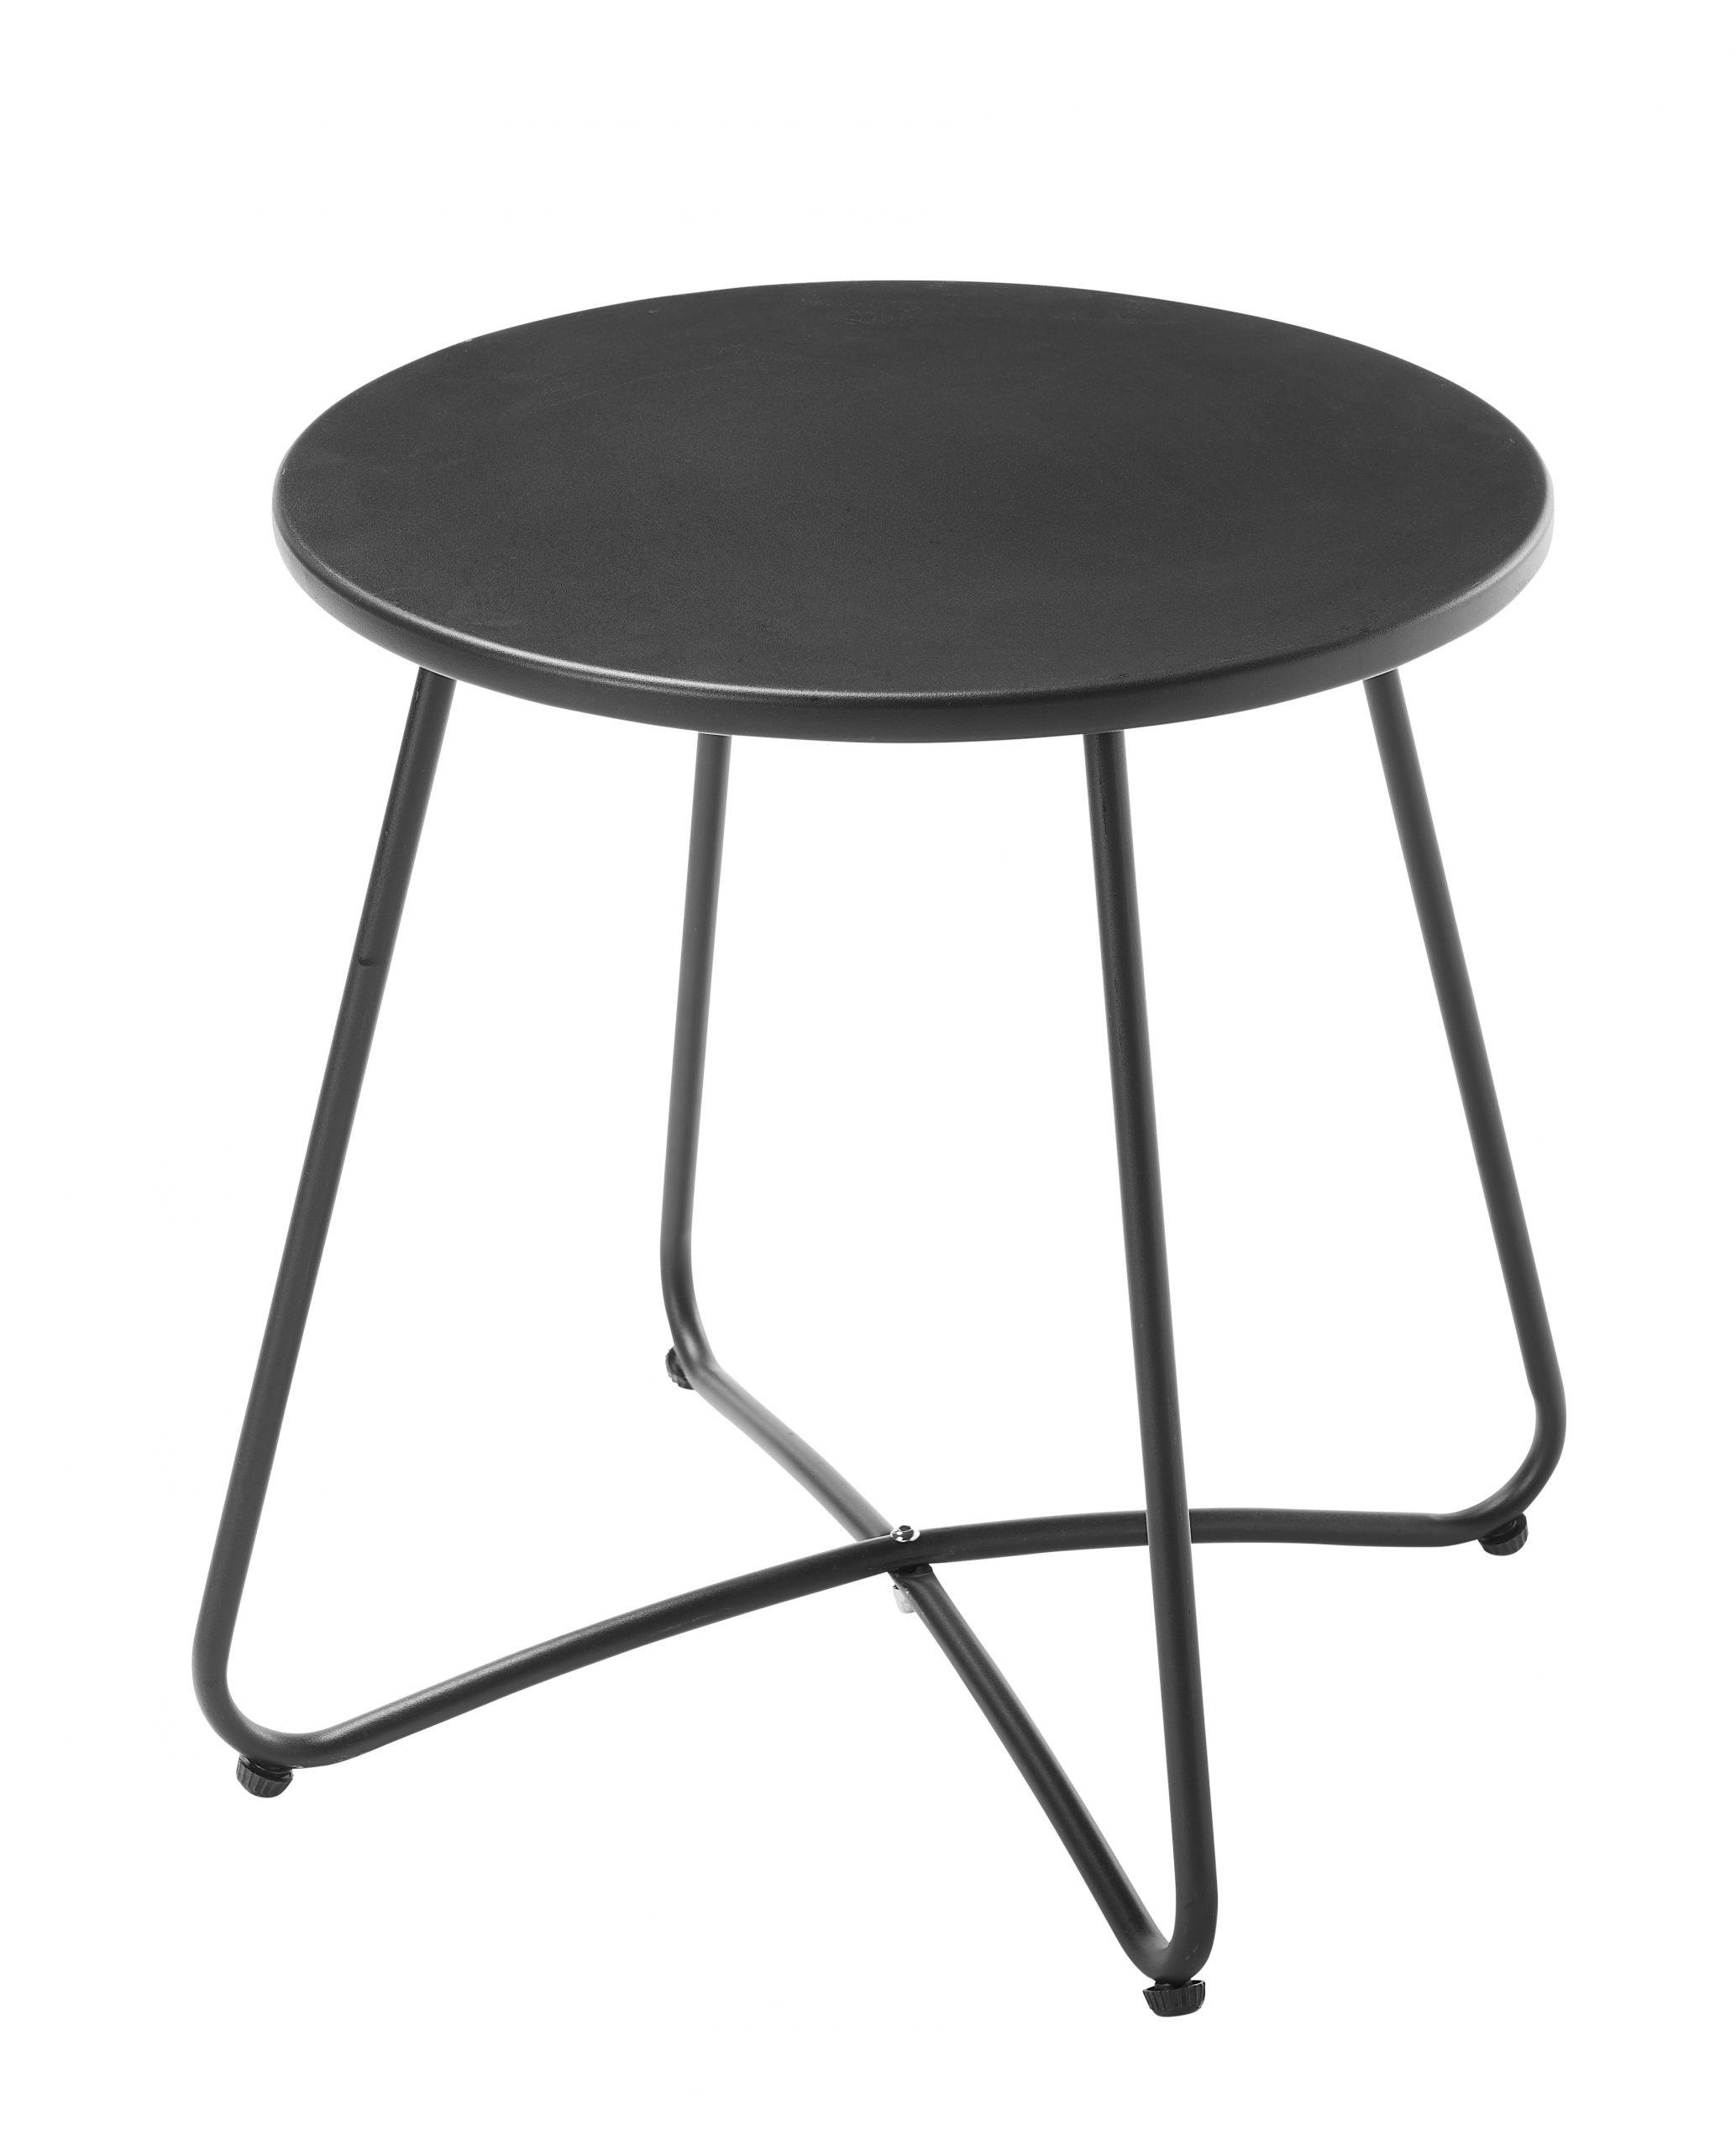 Tavolini Carrefour